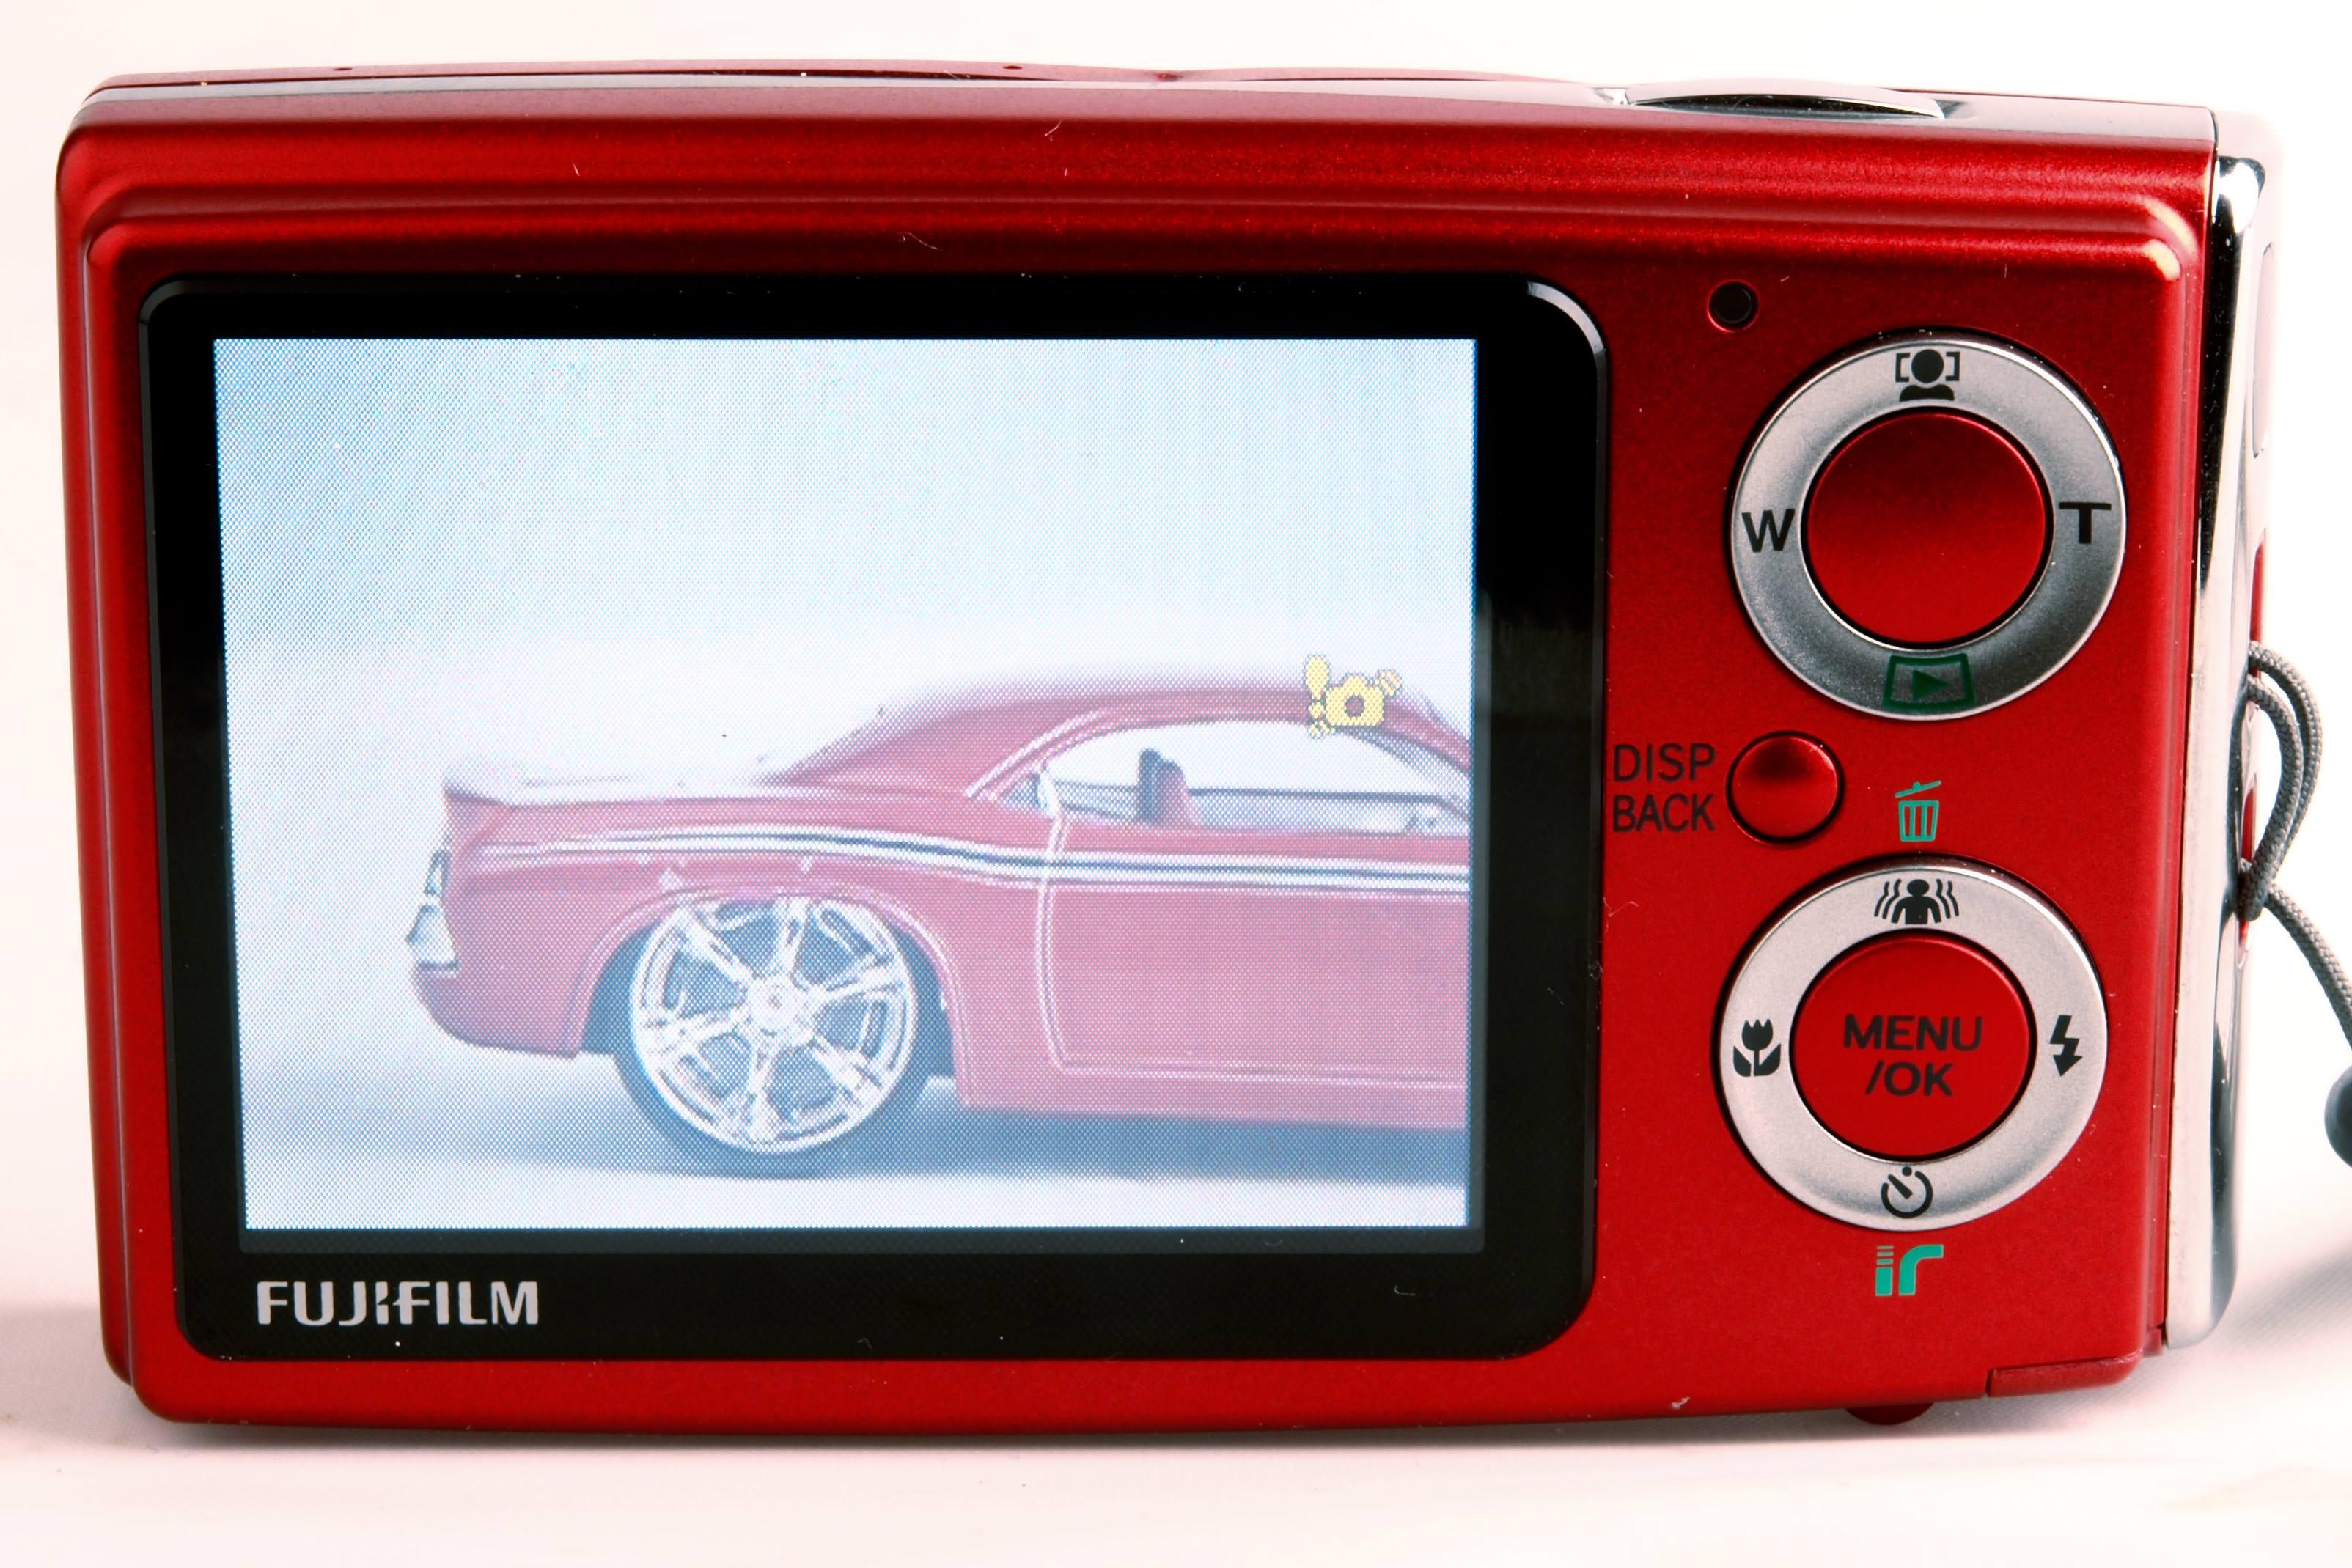 Fujifilm FinePix Z10FD Camera Drivers for Windows XP